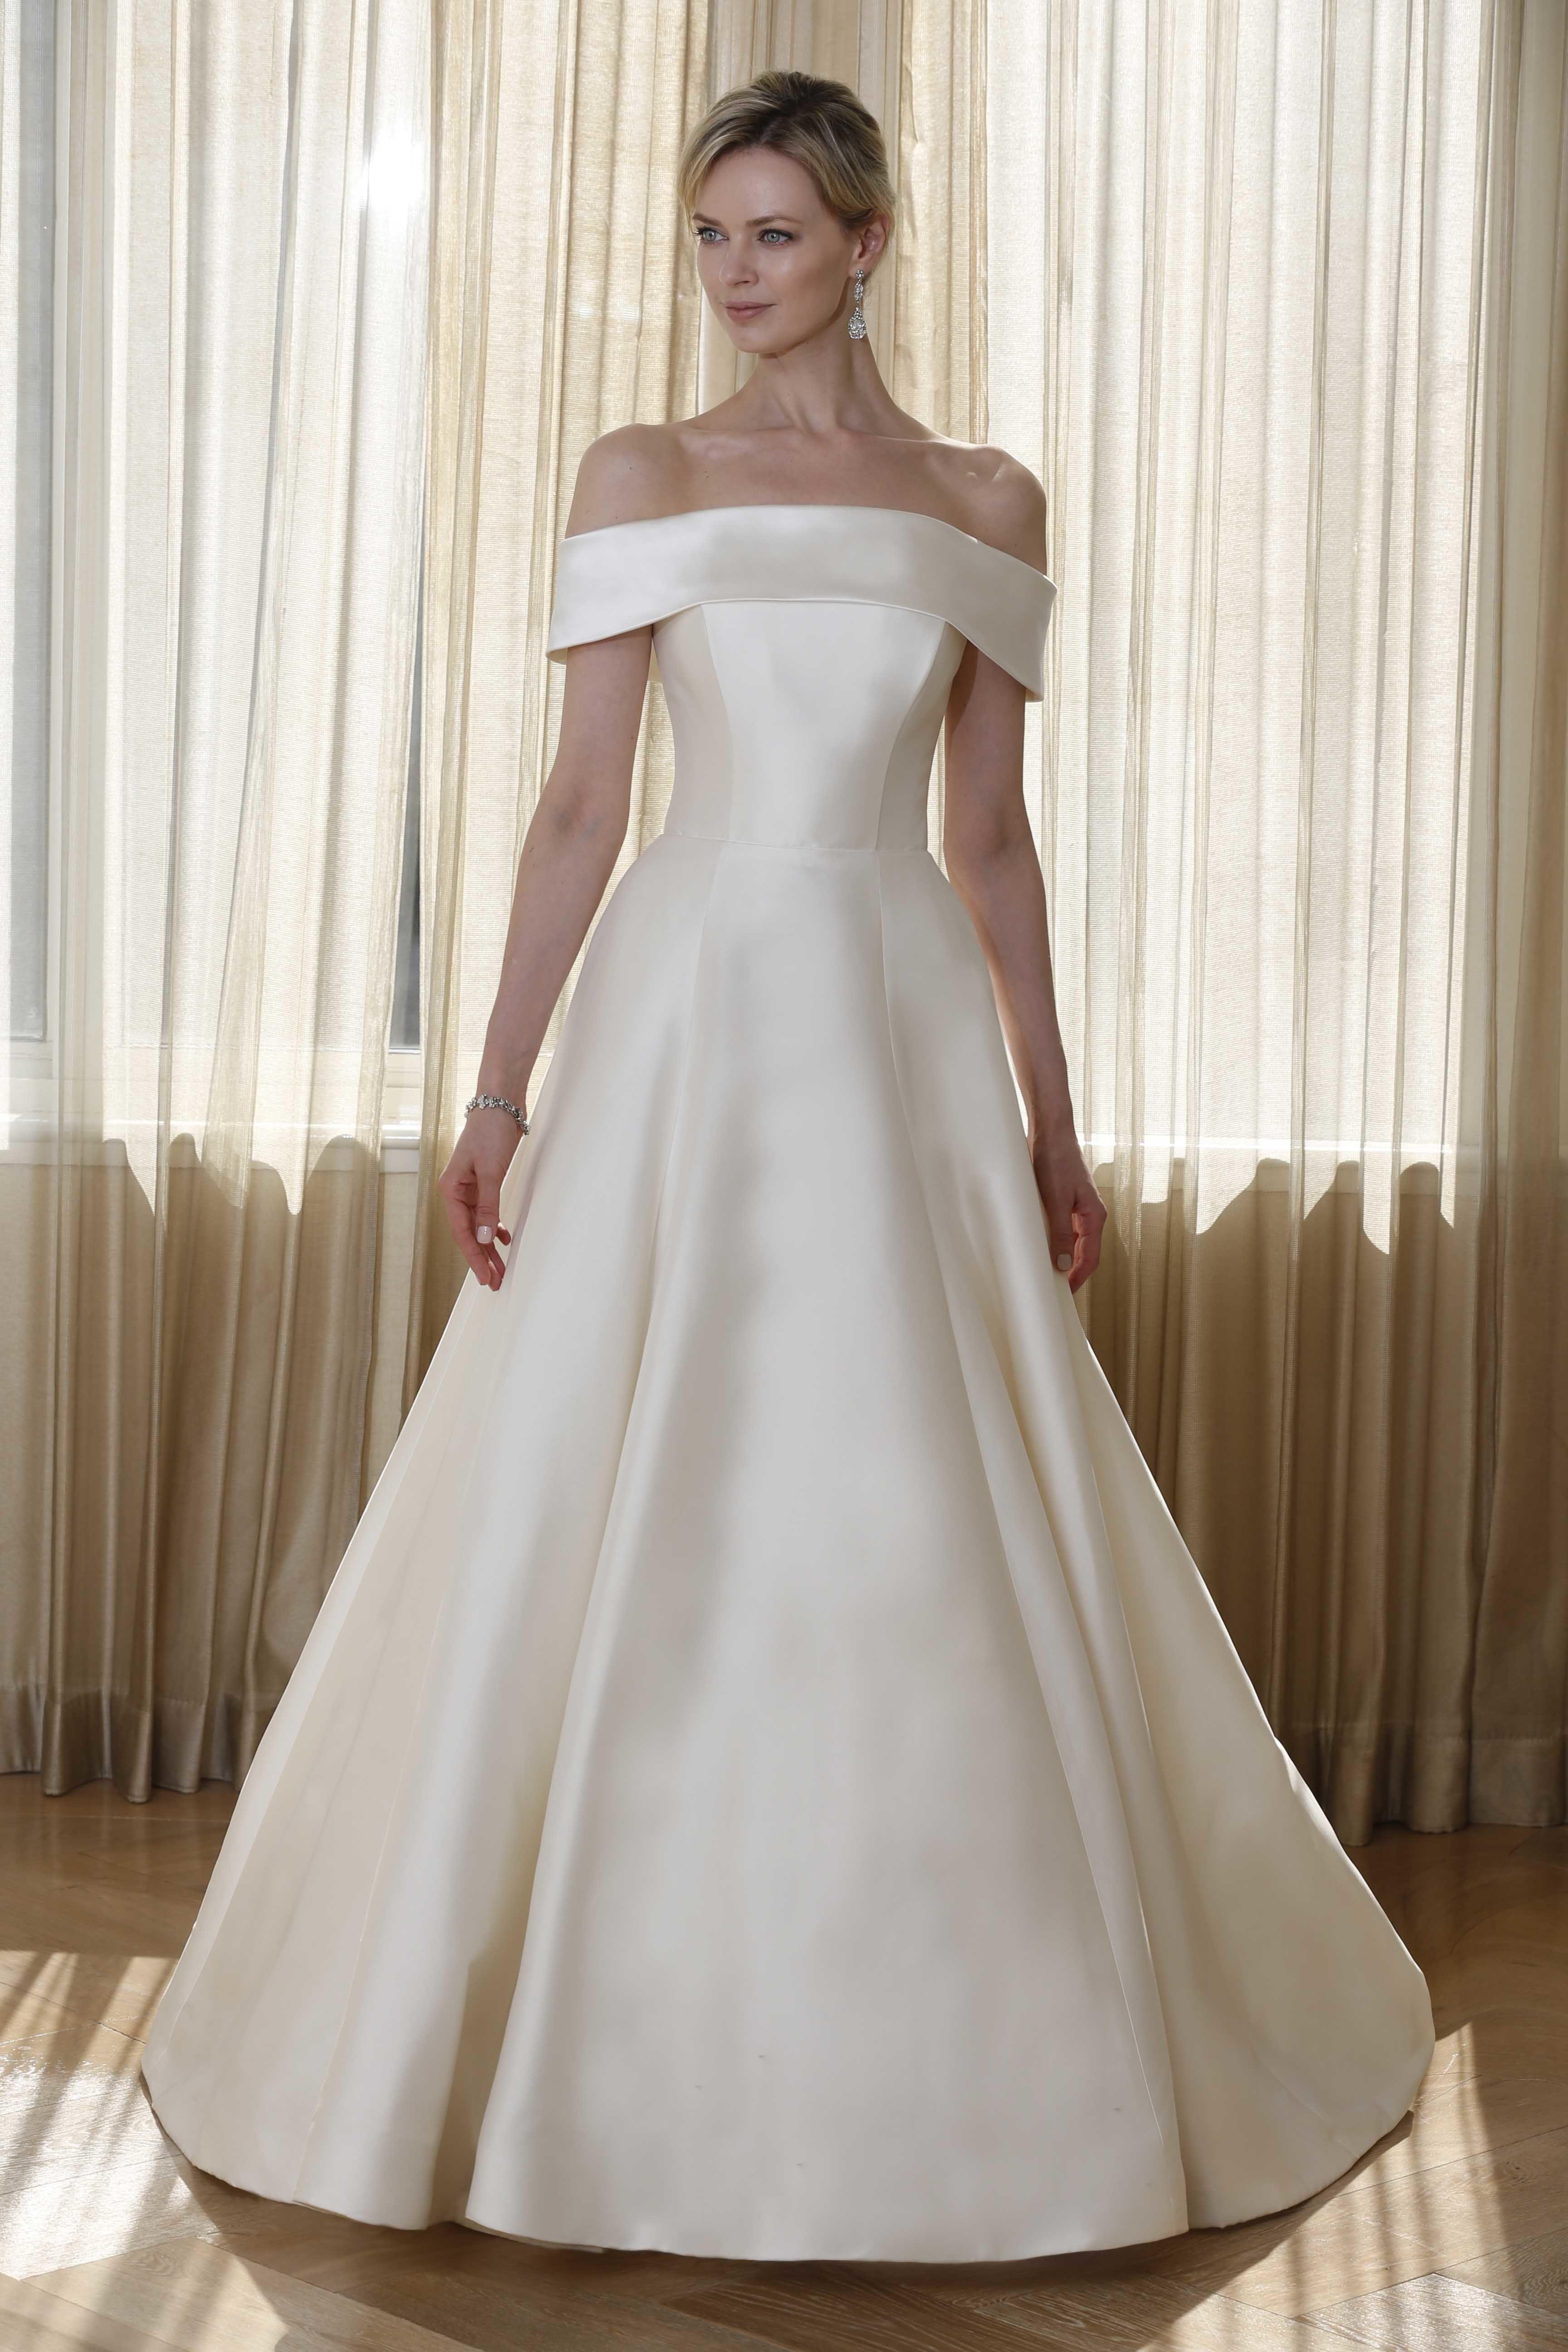 Caroline Castigliano Bridal & Wedding Dress Collection Spring 2019 ...